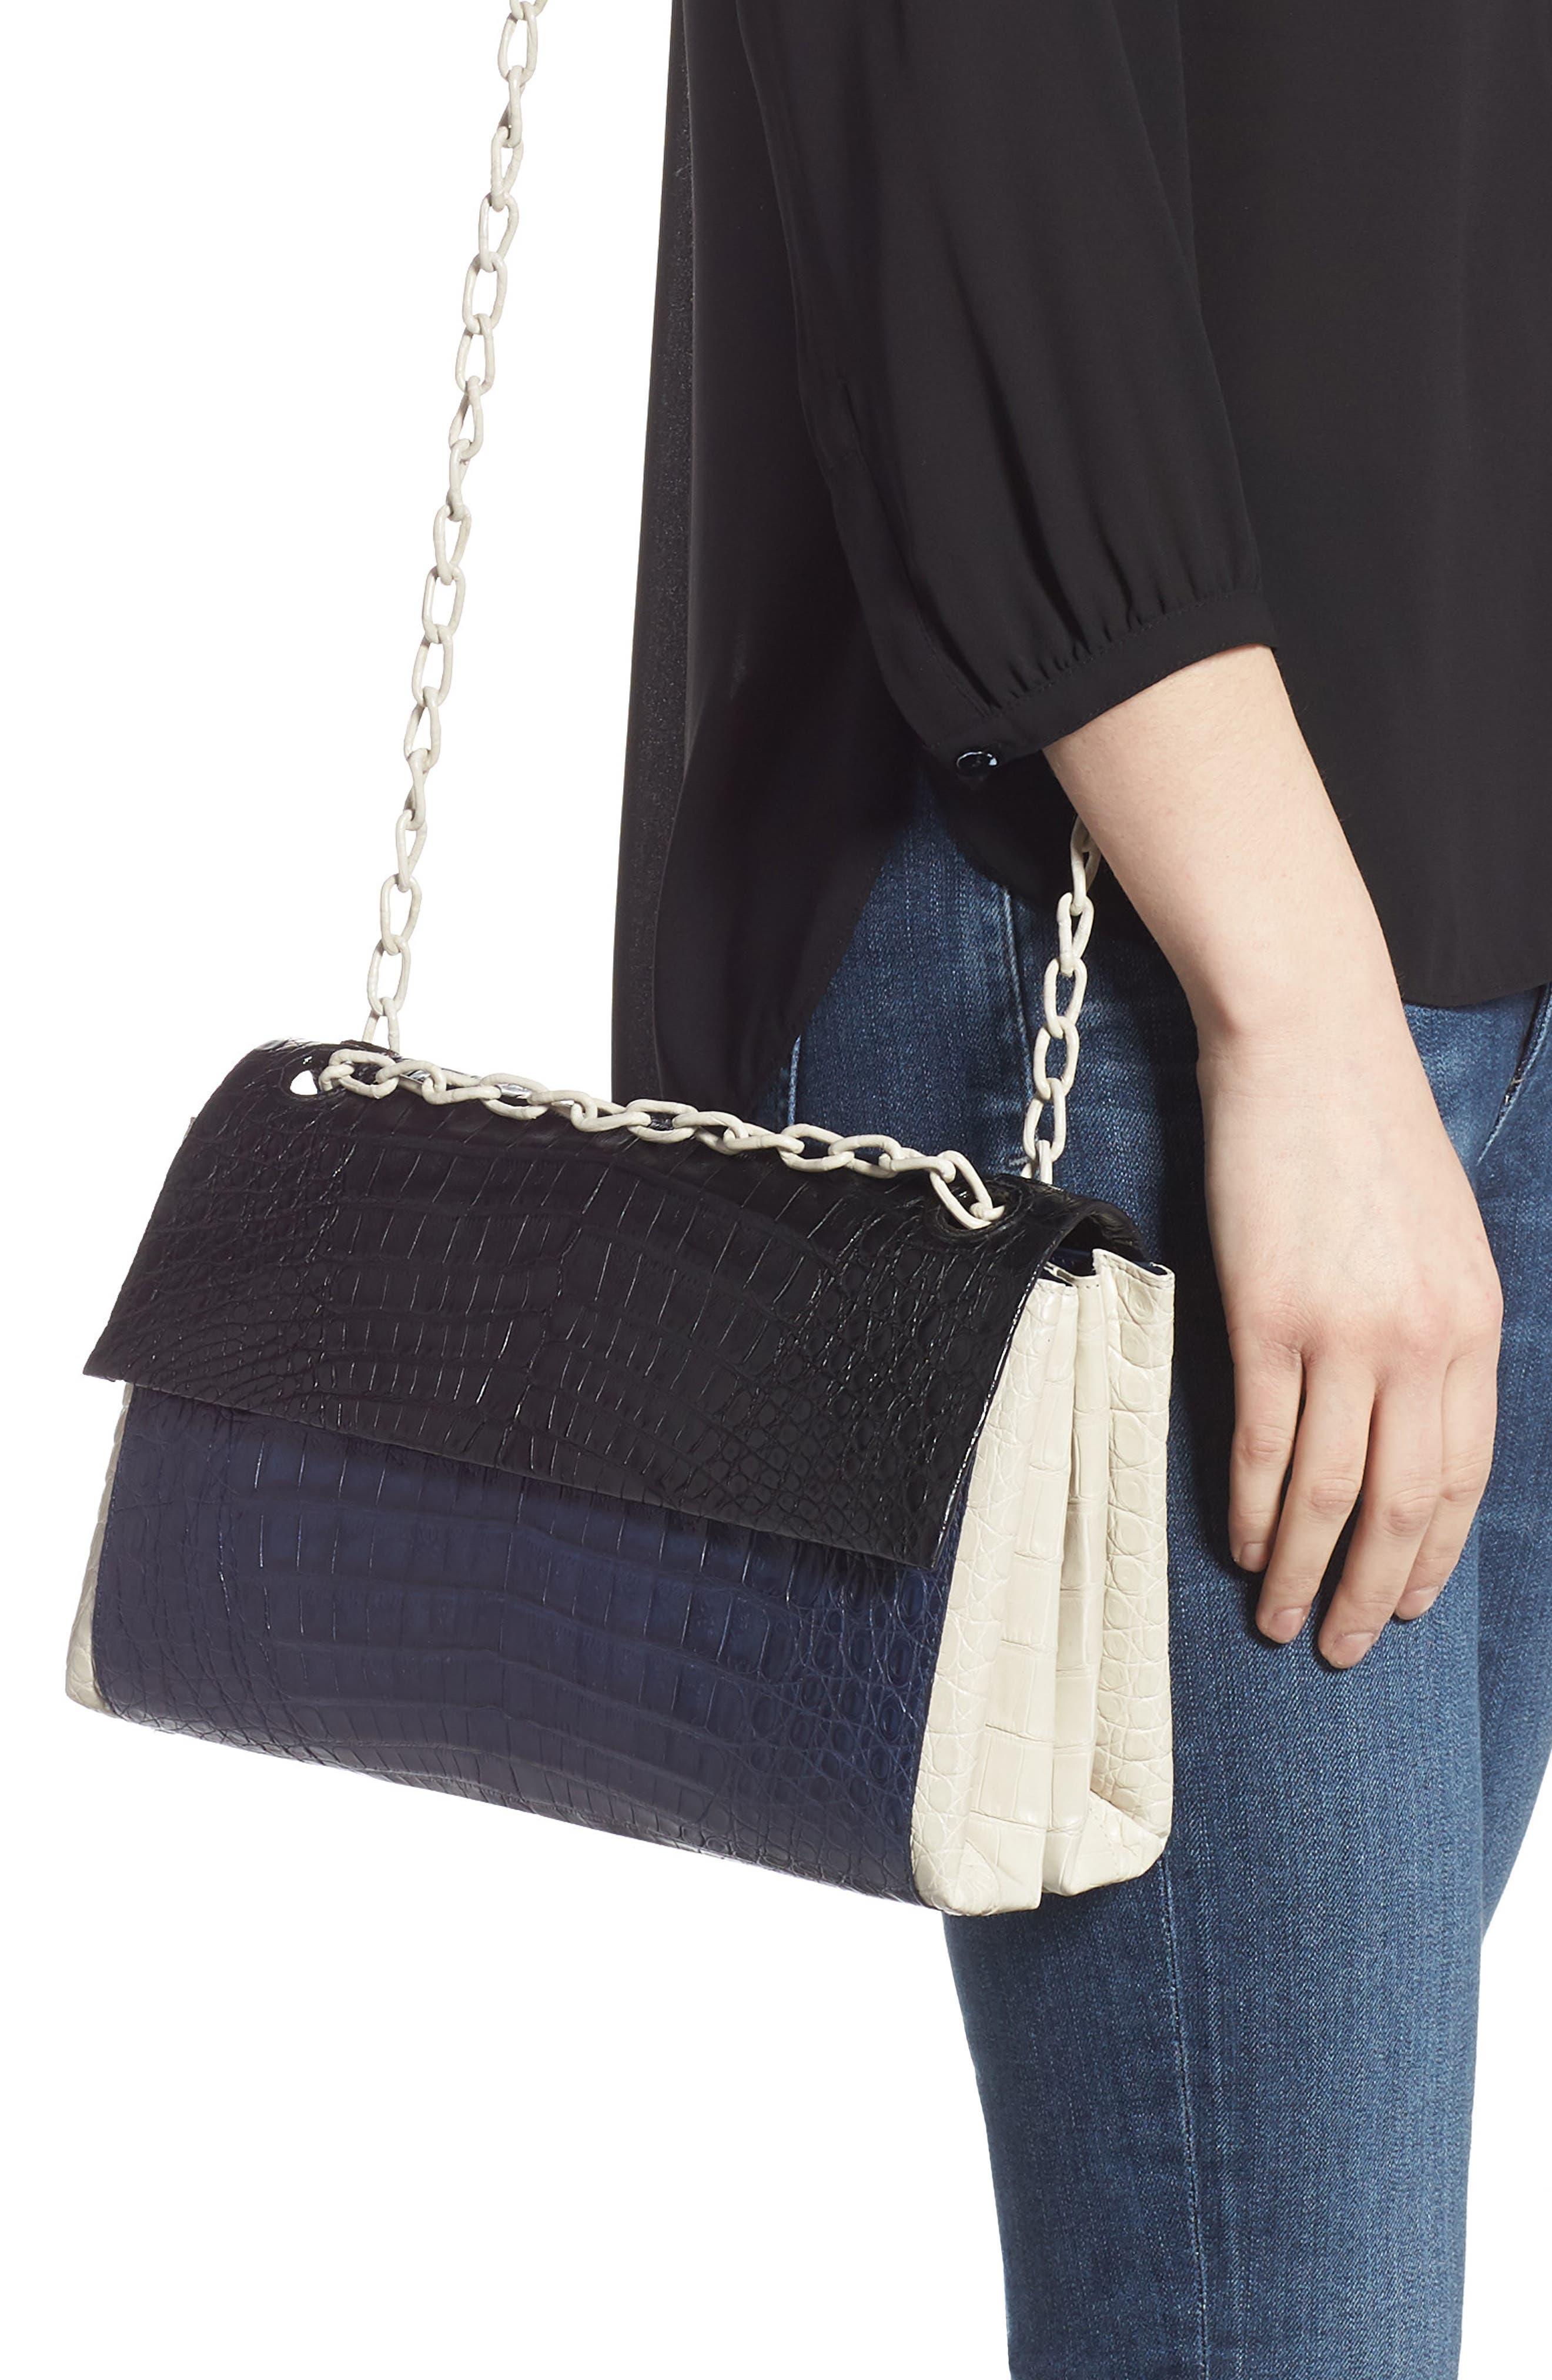 NANCY GONZALEZ, Medium Madison Genuine Crocodile Shoulder Bag, Alternate thumbnail 3, color, BLACK / NAVY/ LIGHT GREY